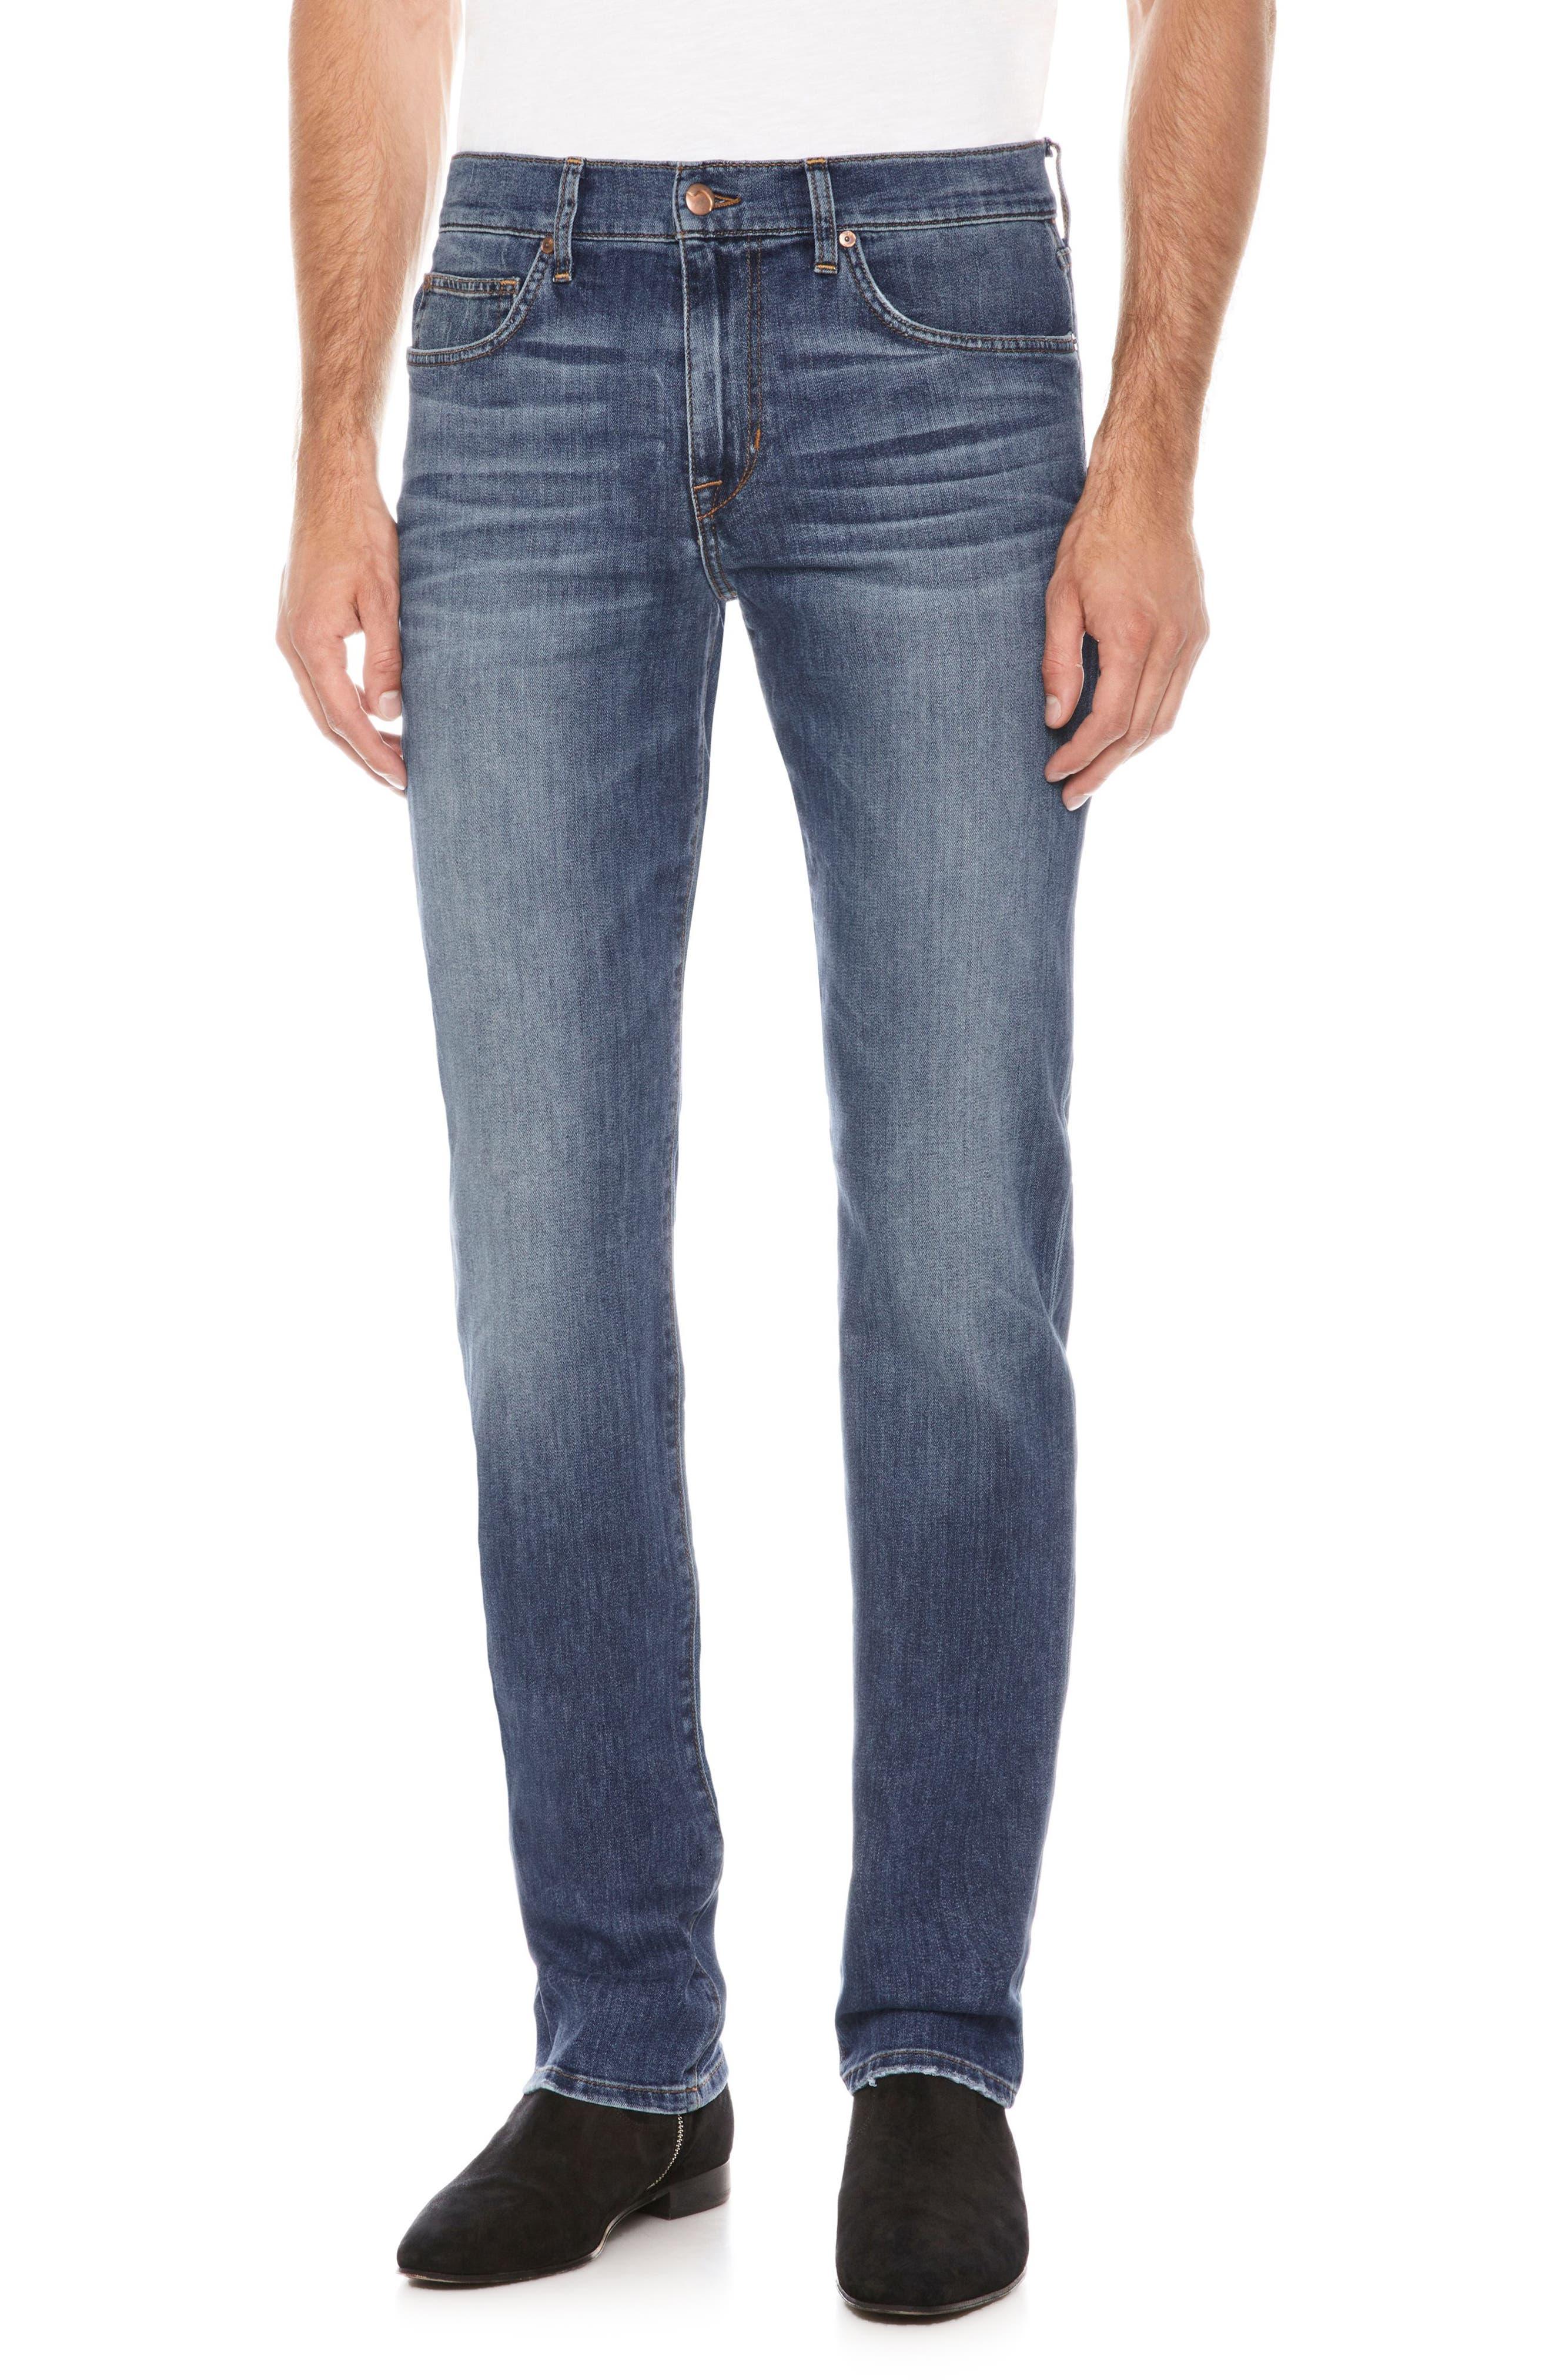 Folsom Slim Fit Jeans,                         Main,                         color, Freeman